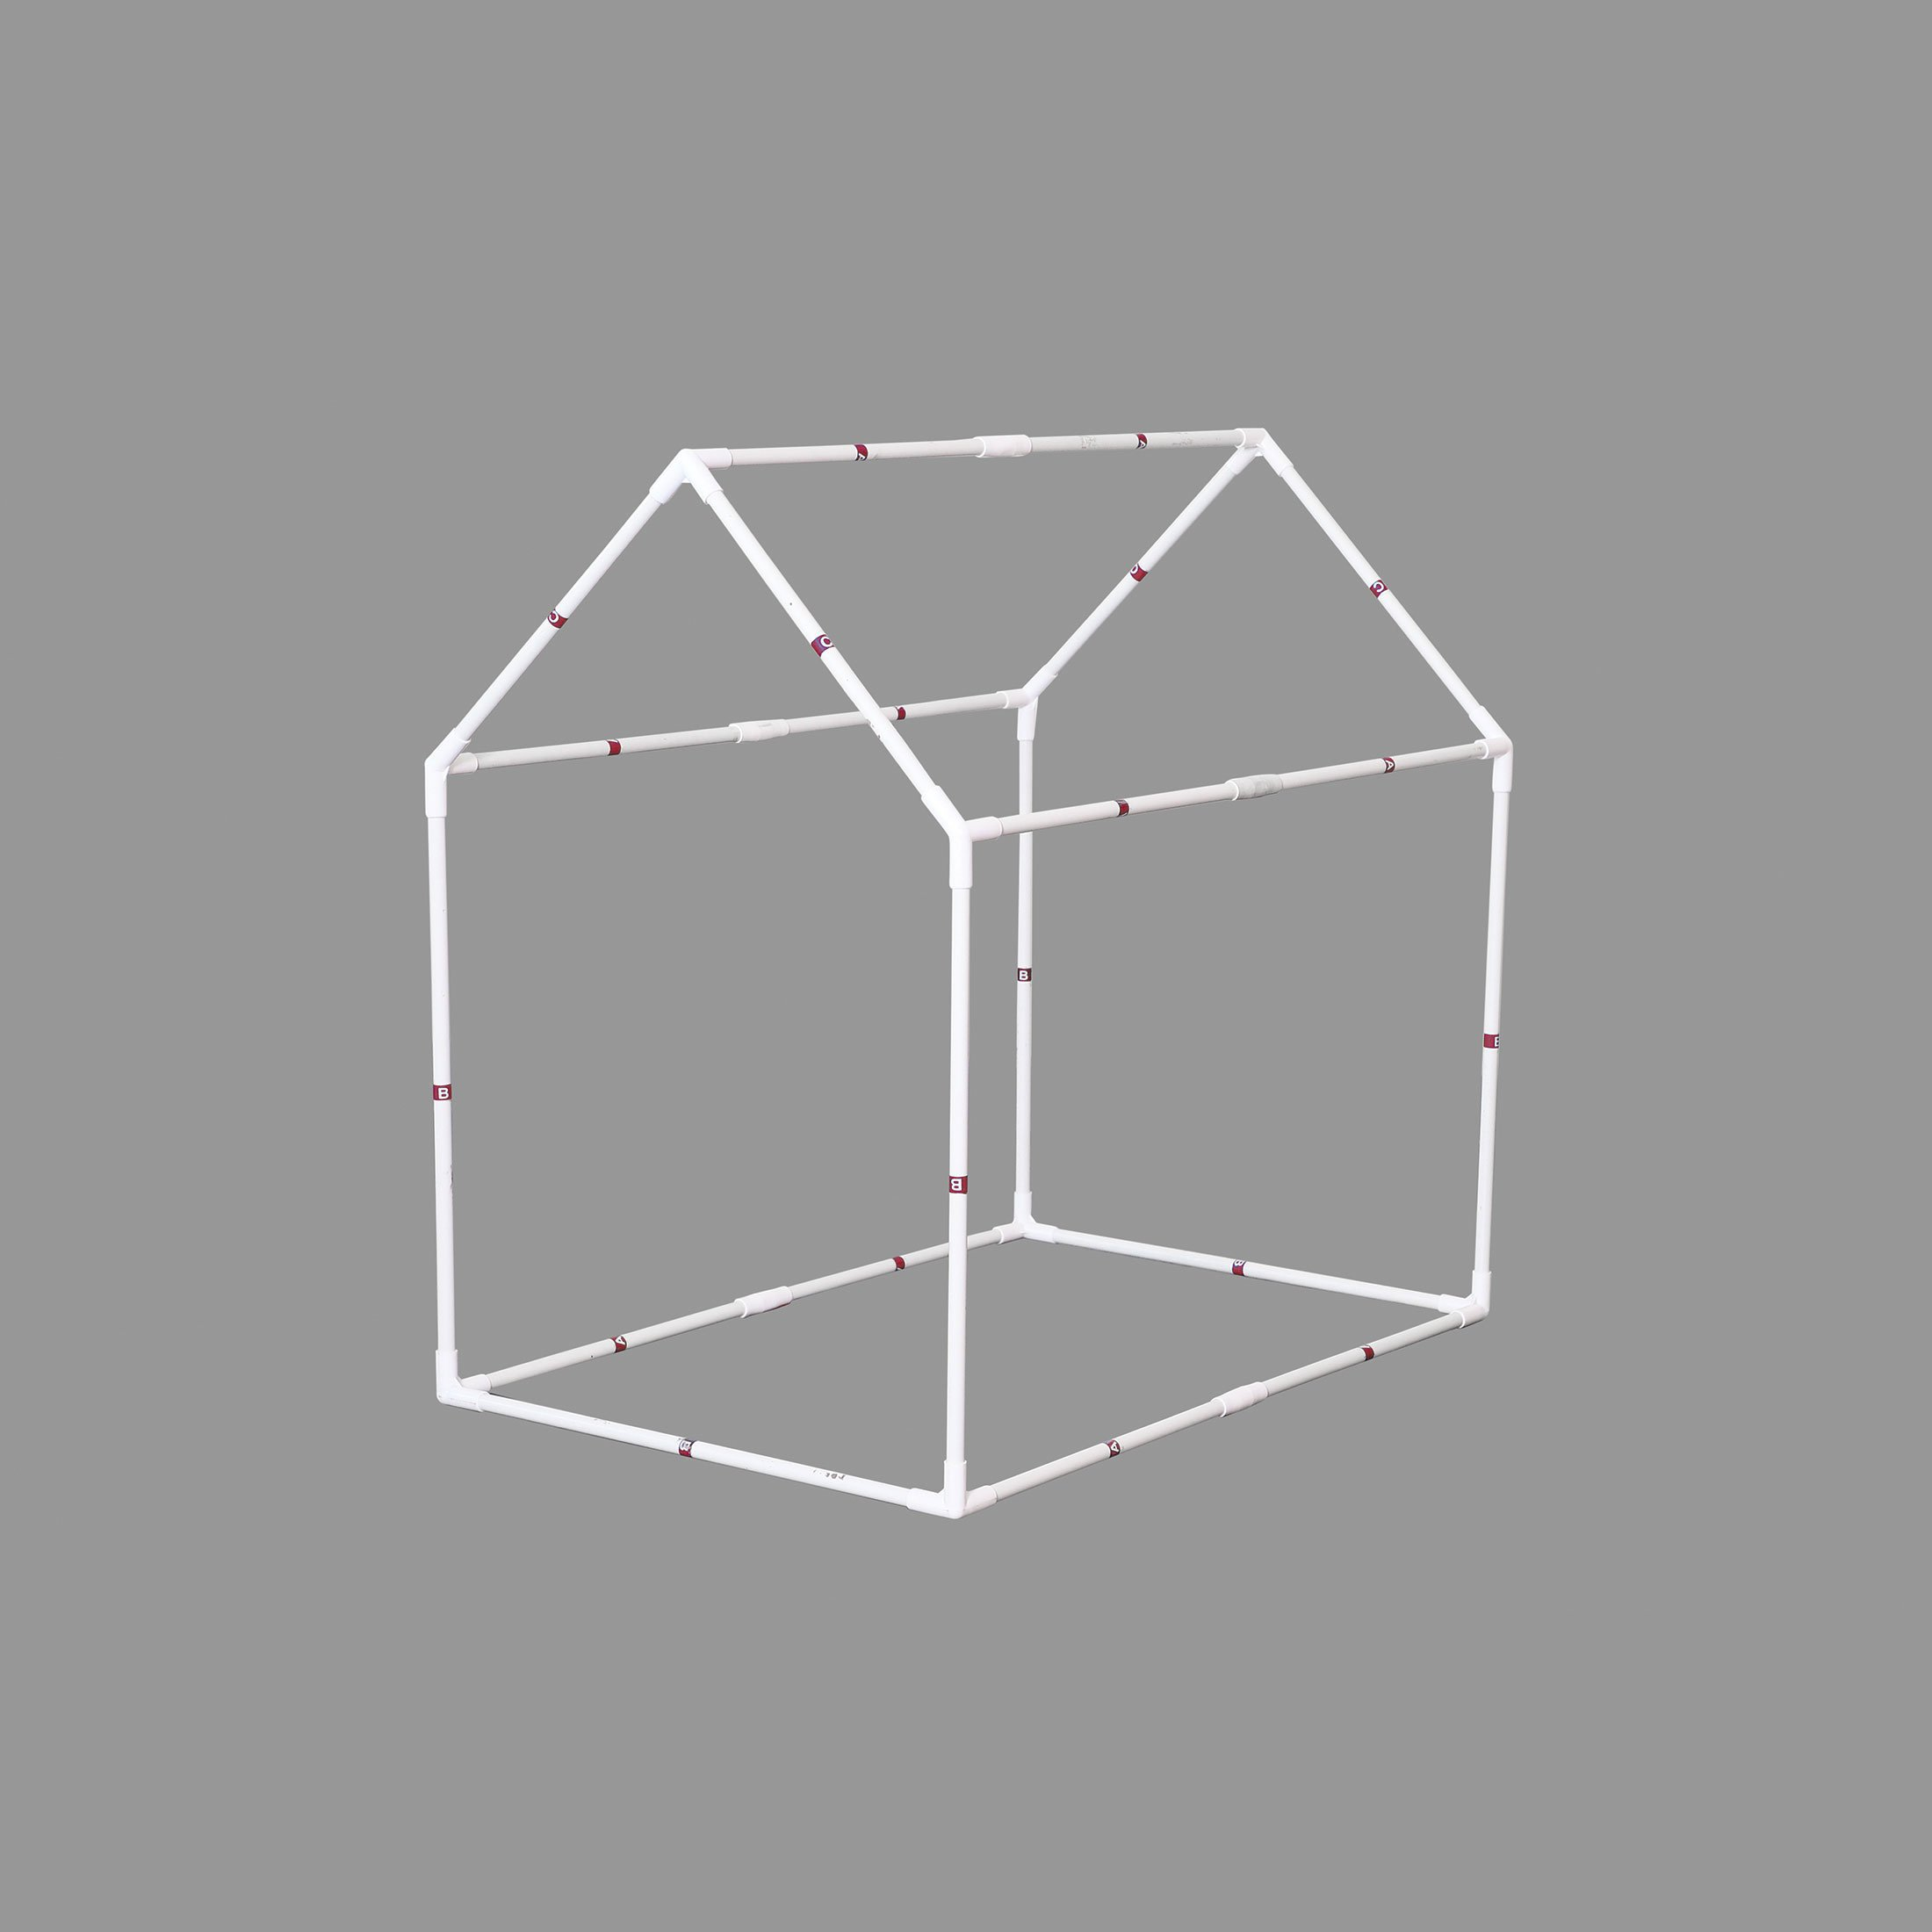 miniproduct-image